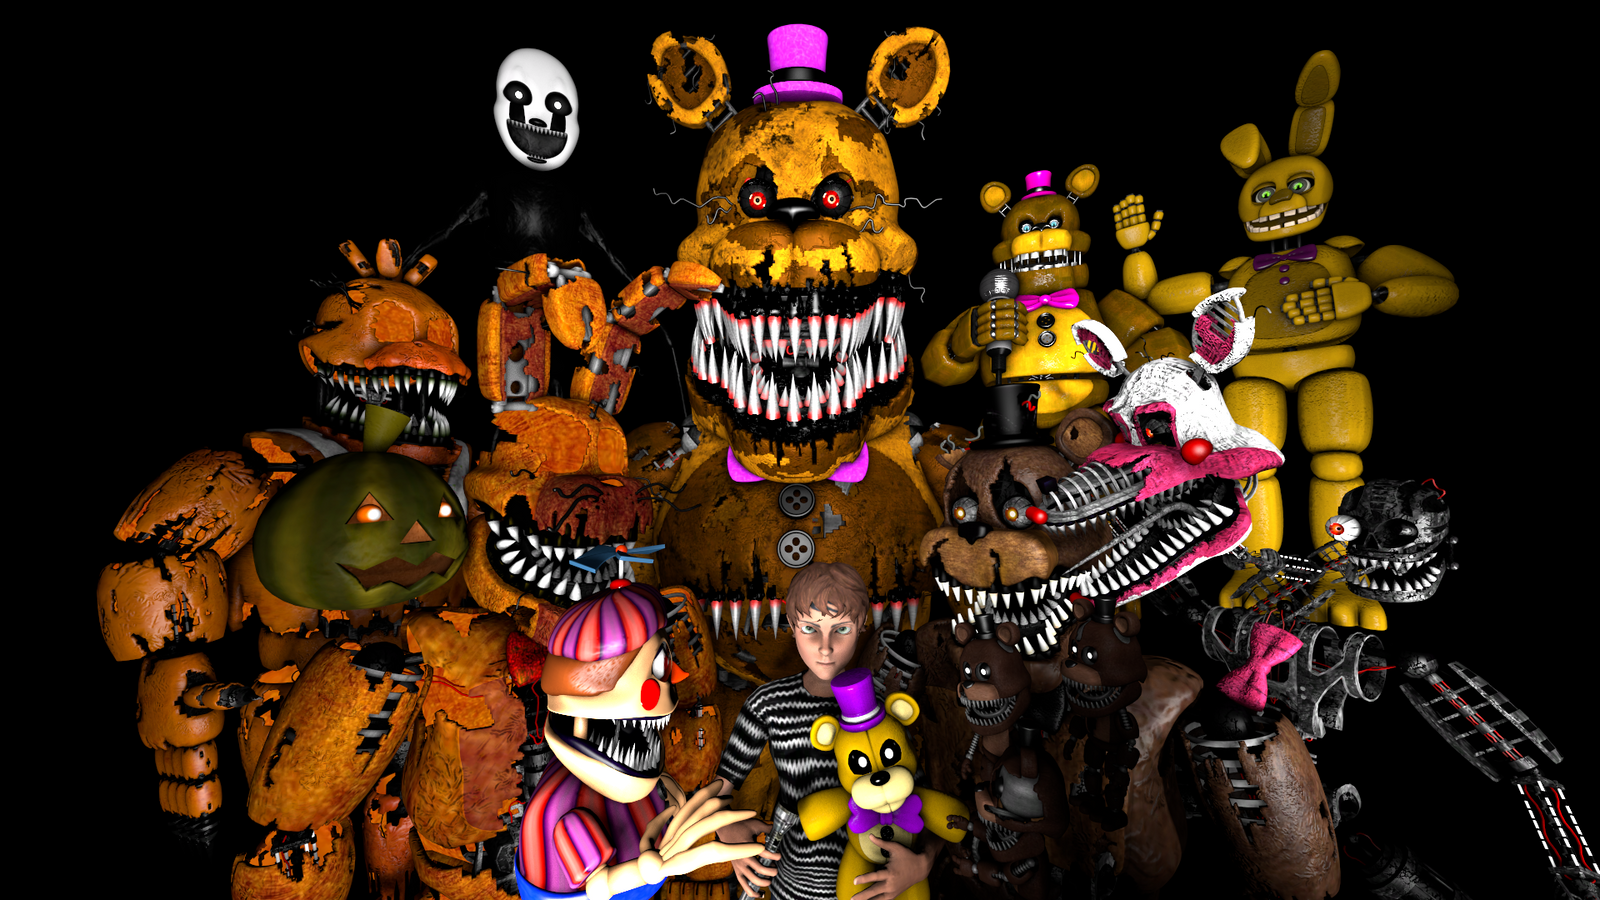 FNAF 4 Halloween by Xboxking37 on DeviantArt